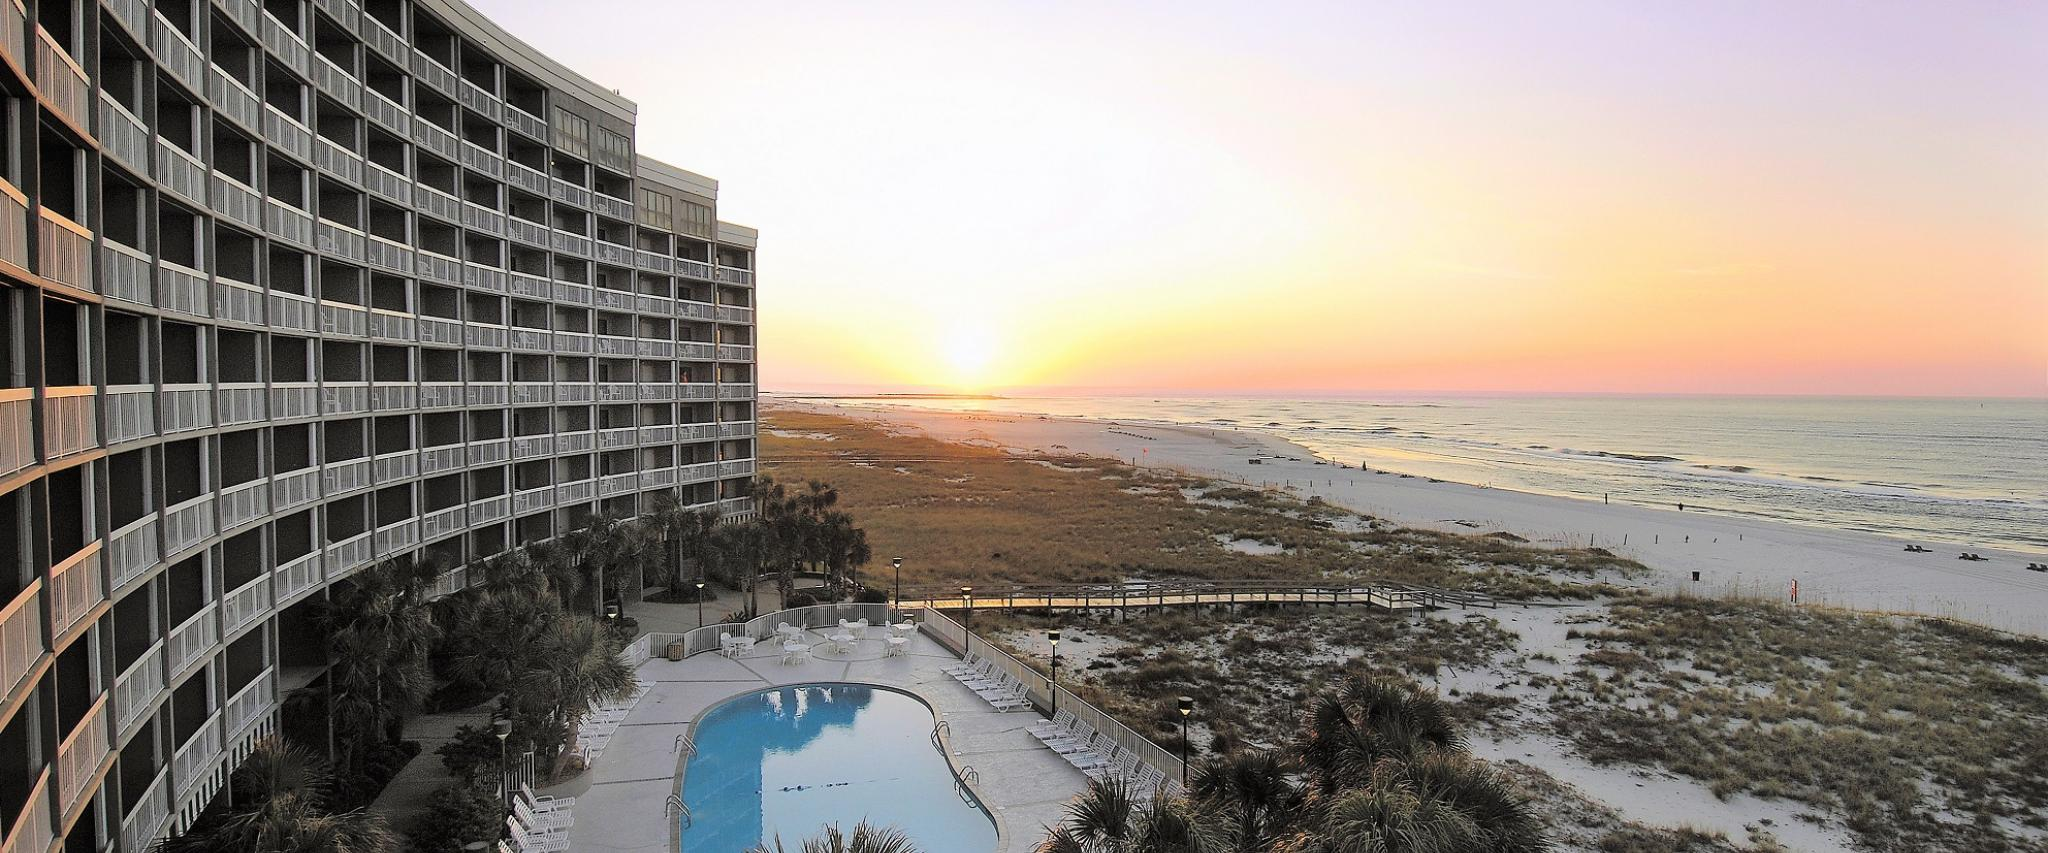 Top 20 Hotels In Gulf Shores Orange Beach 2019